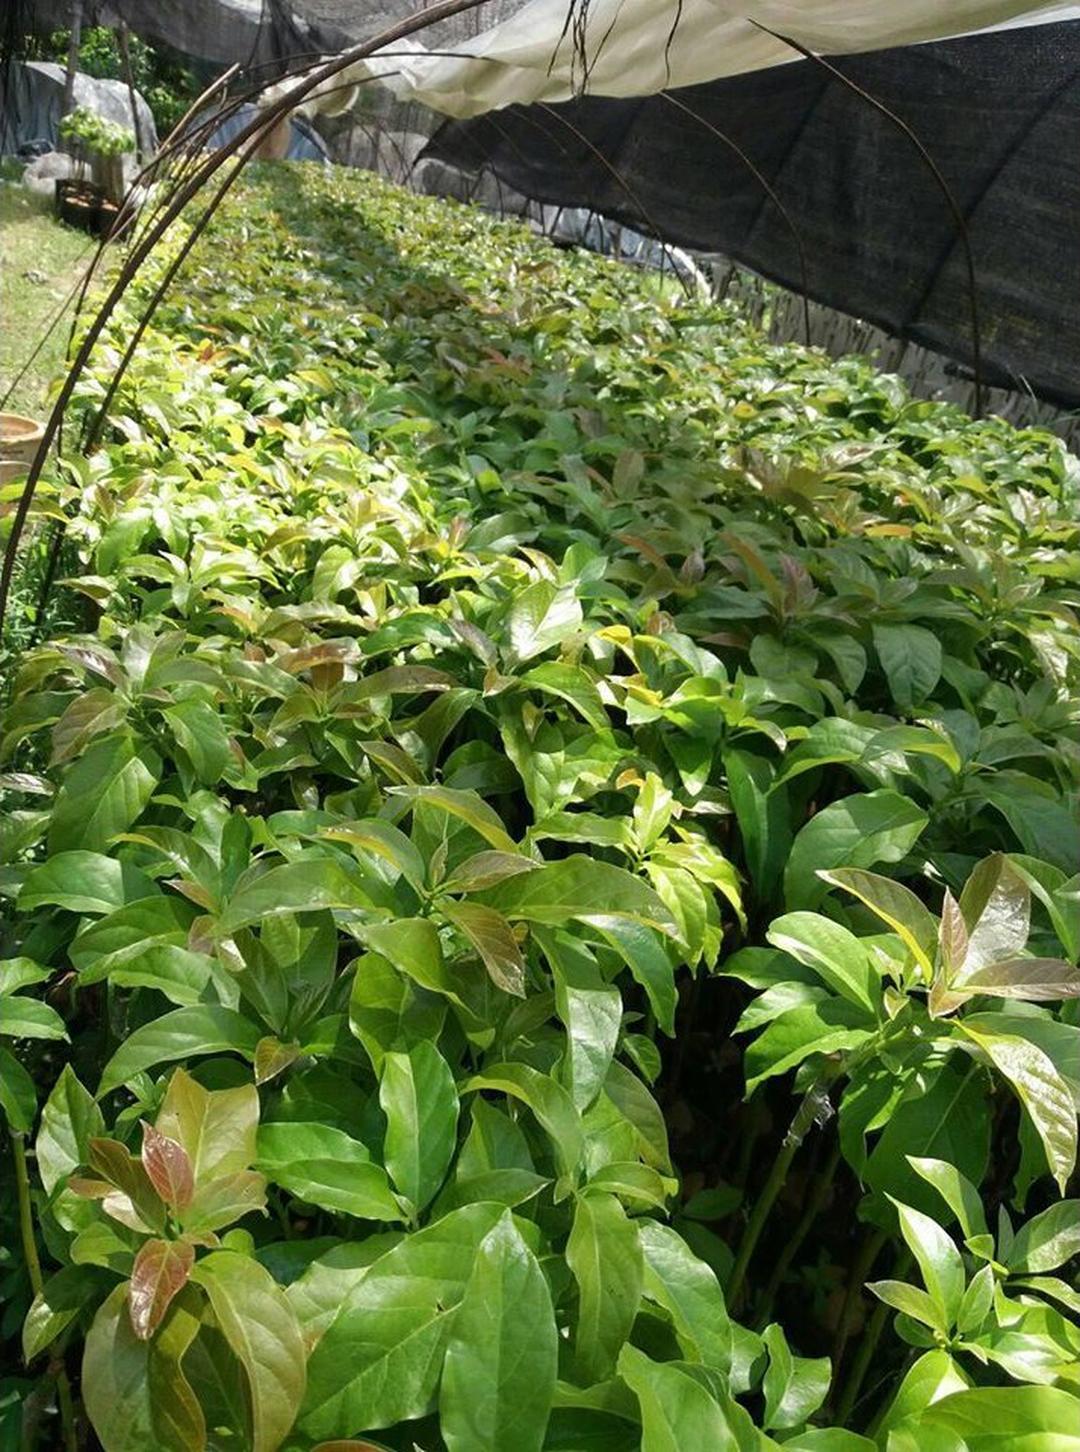 Obral! New bibit tanaman buah alpukat shepard Kota Bandung #bibit buah genjah murah